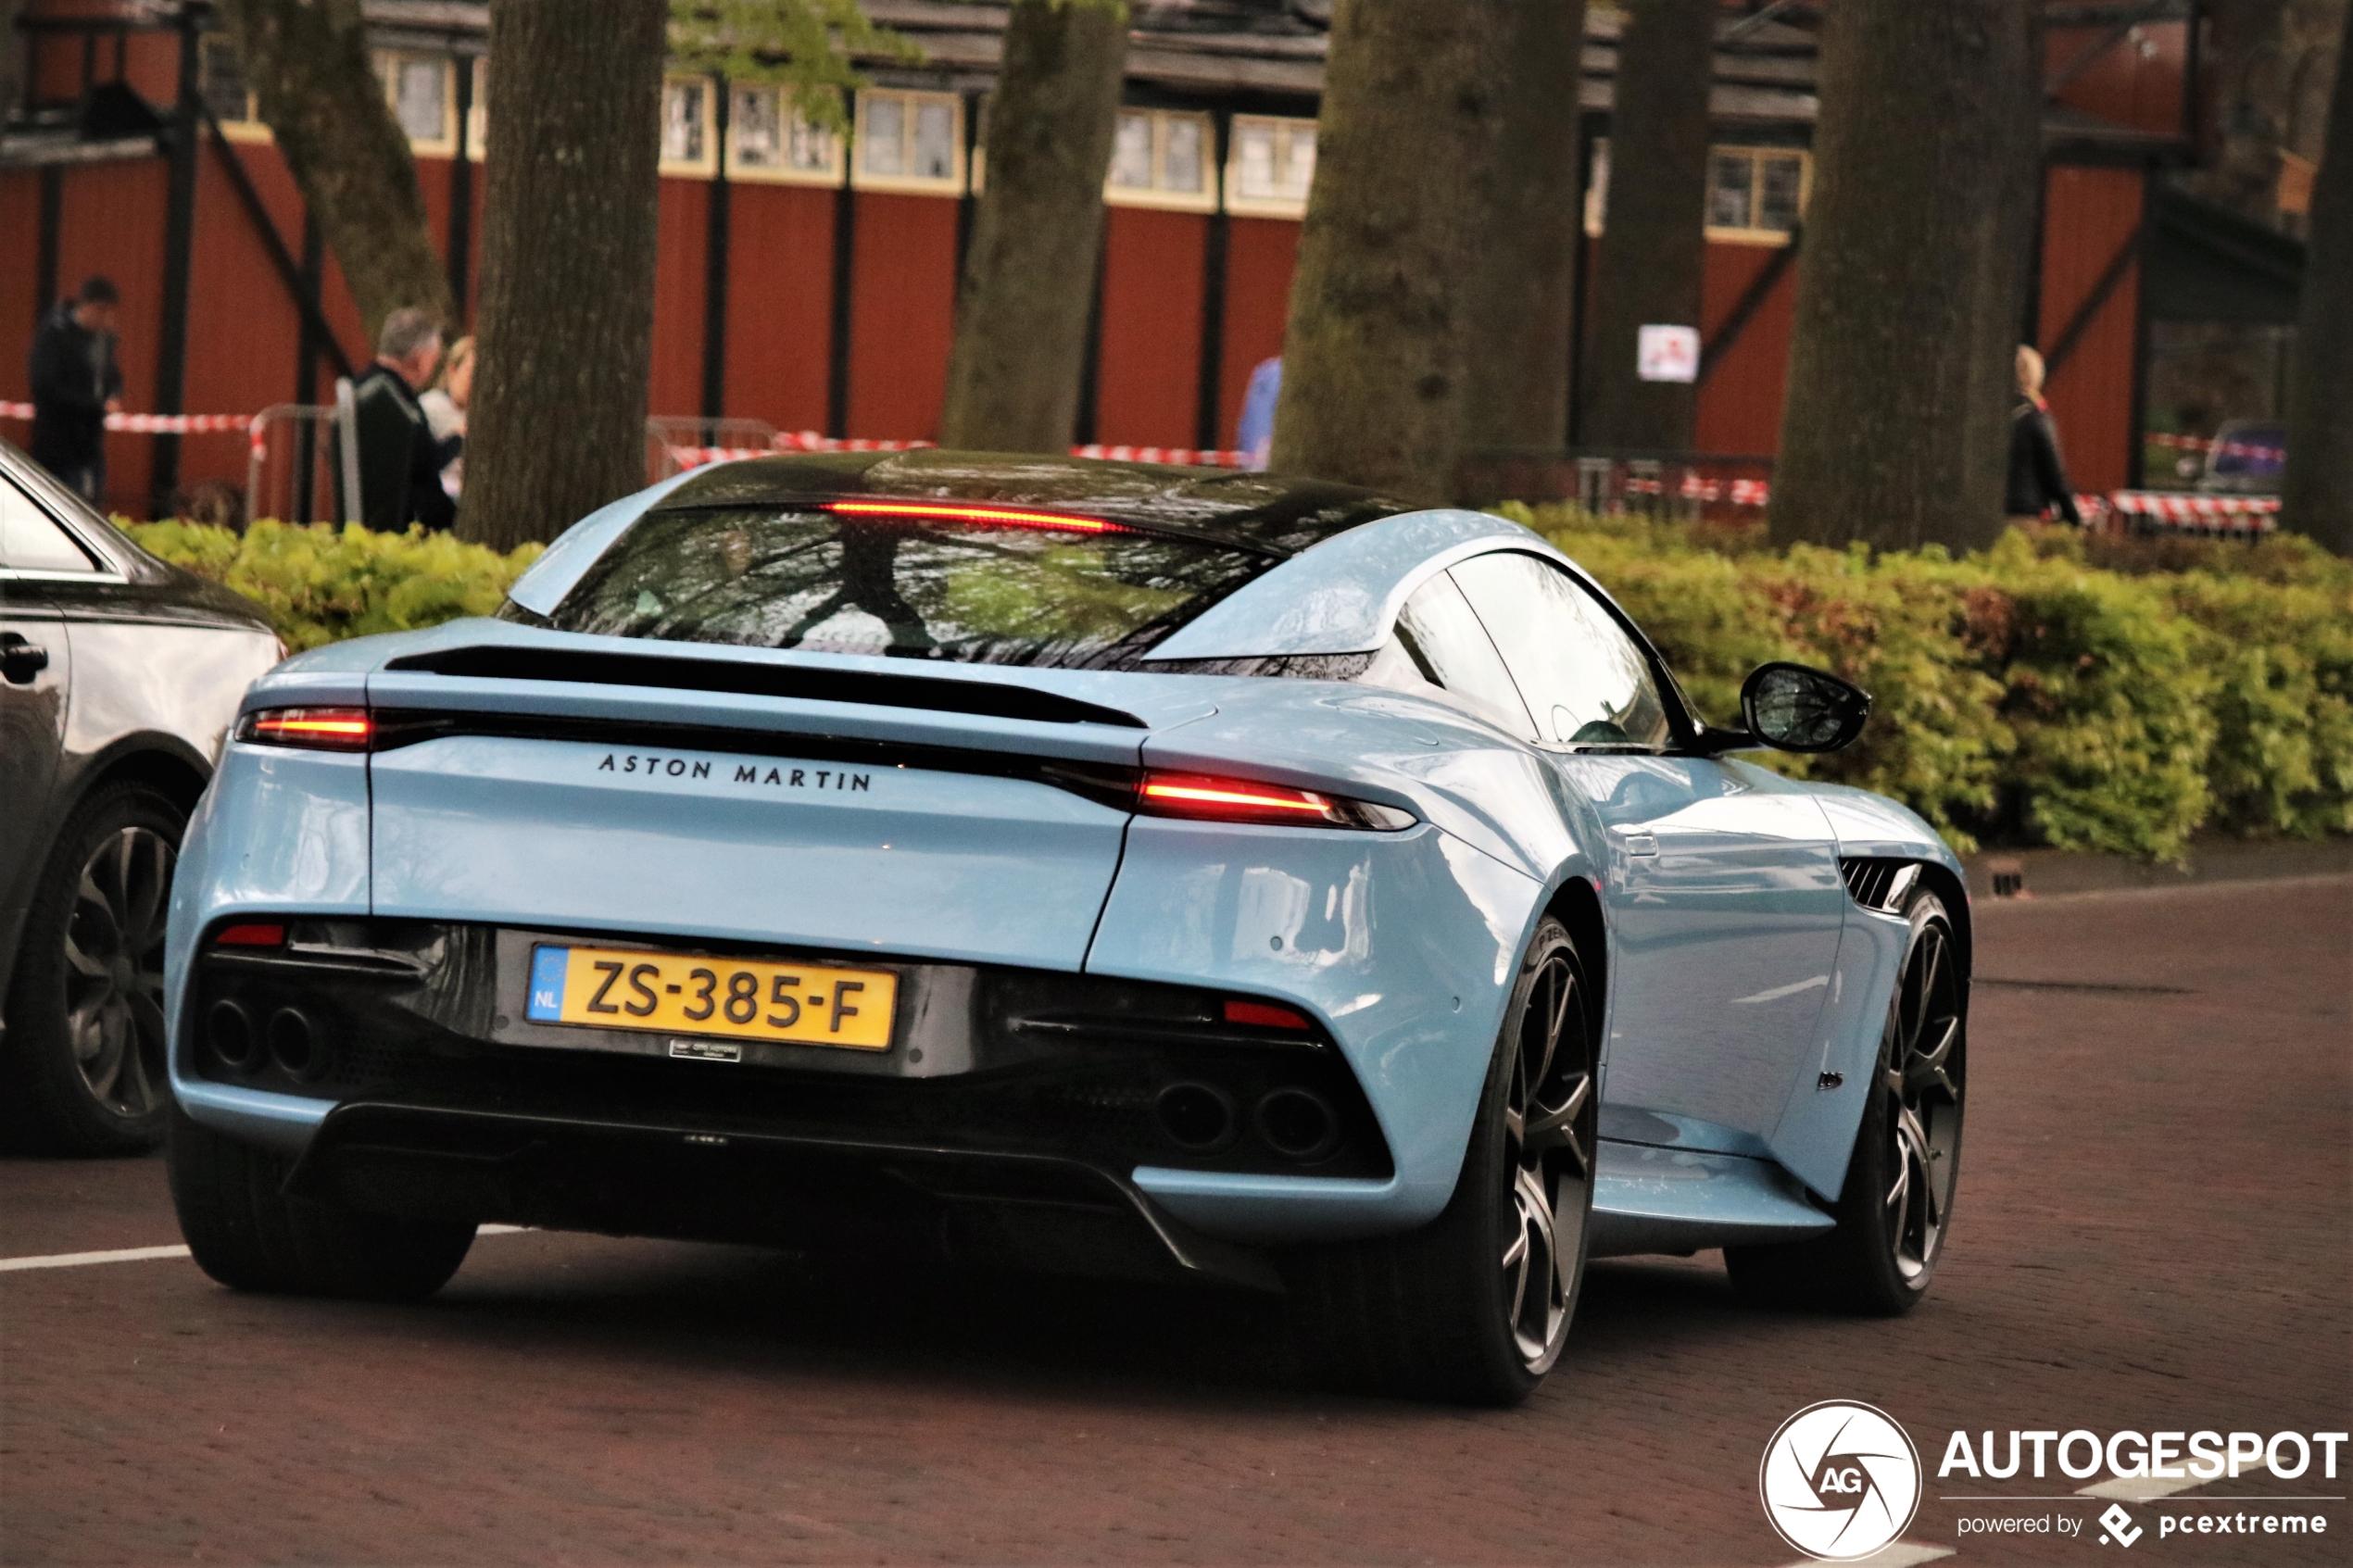 Laren levert wederom: Aston Martin DBS Superleggera